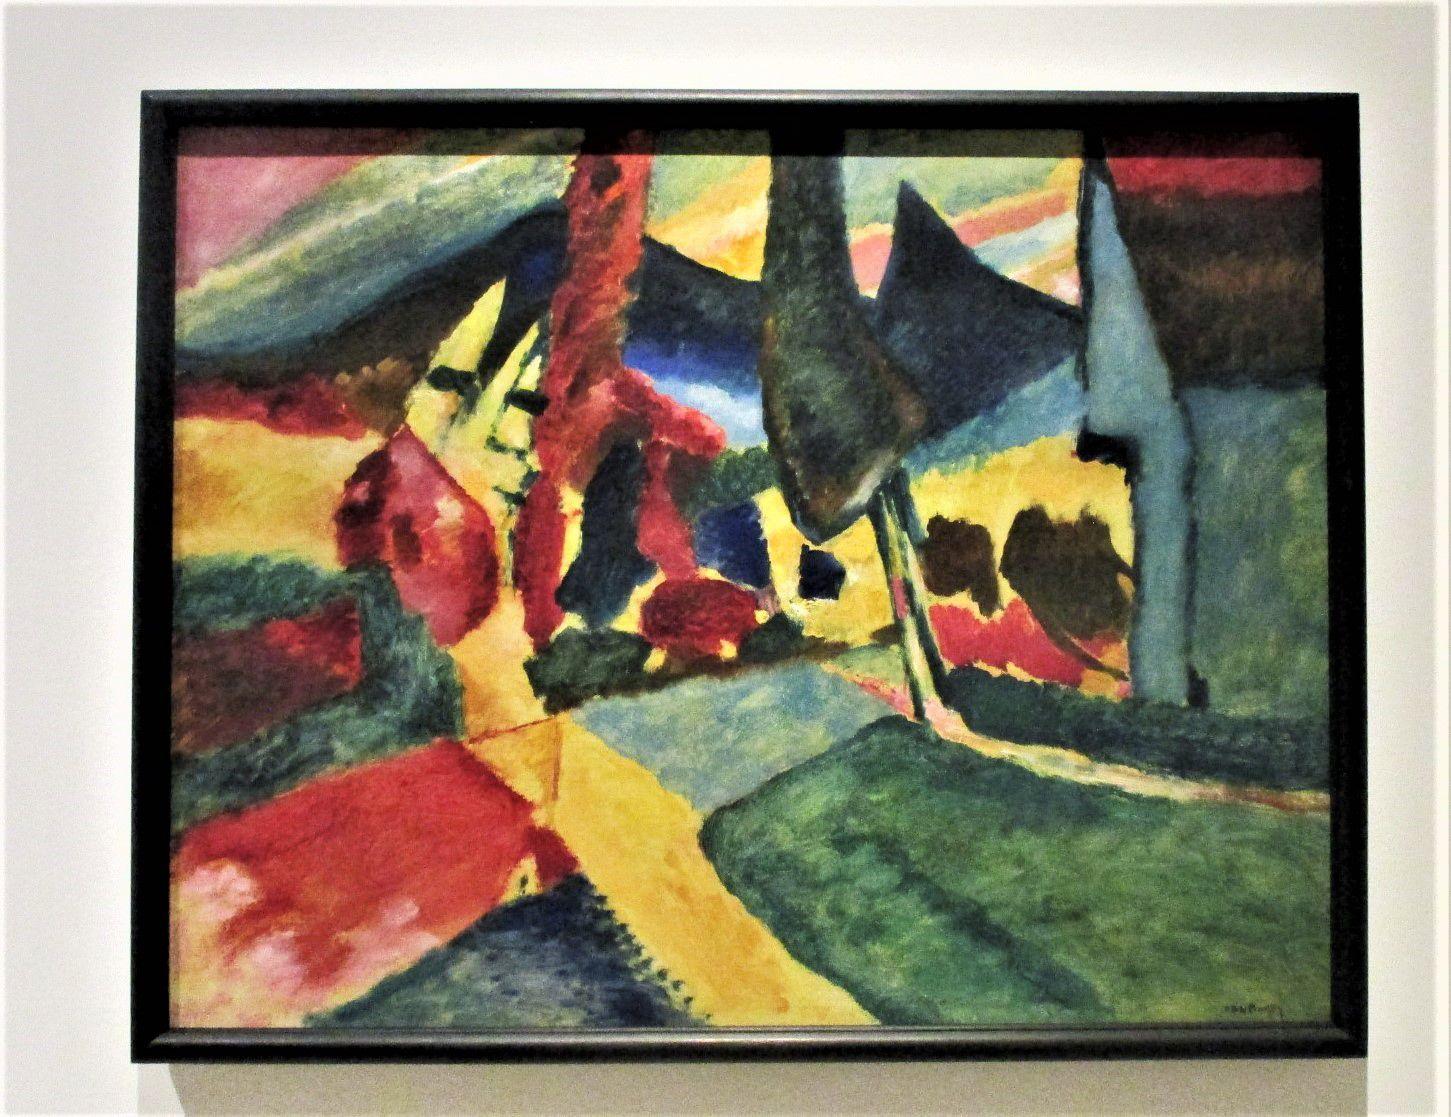 Paysage aux deux peupliers - Vassili Kandinsky, 1912